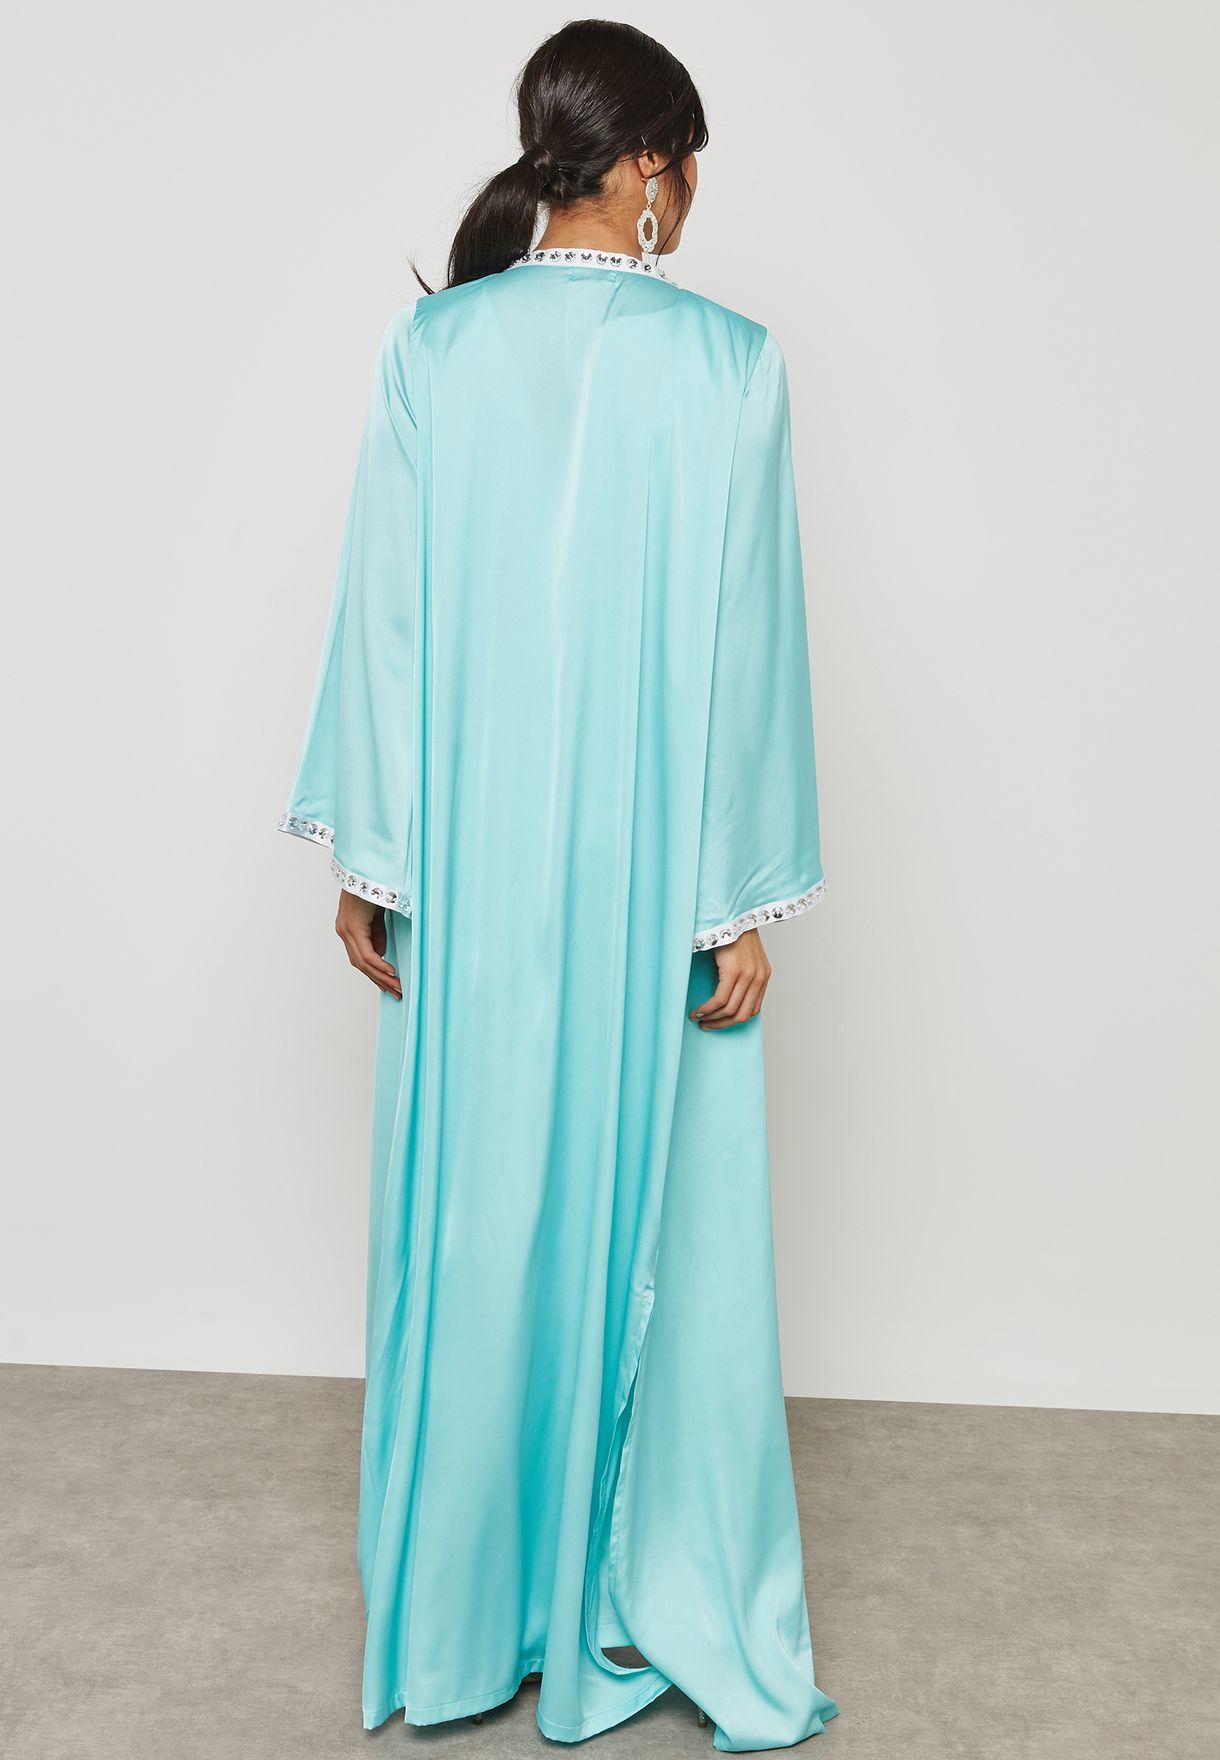 2 In 1 Studded Trim Cape Maxi Dress